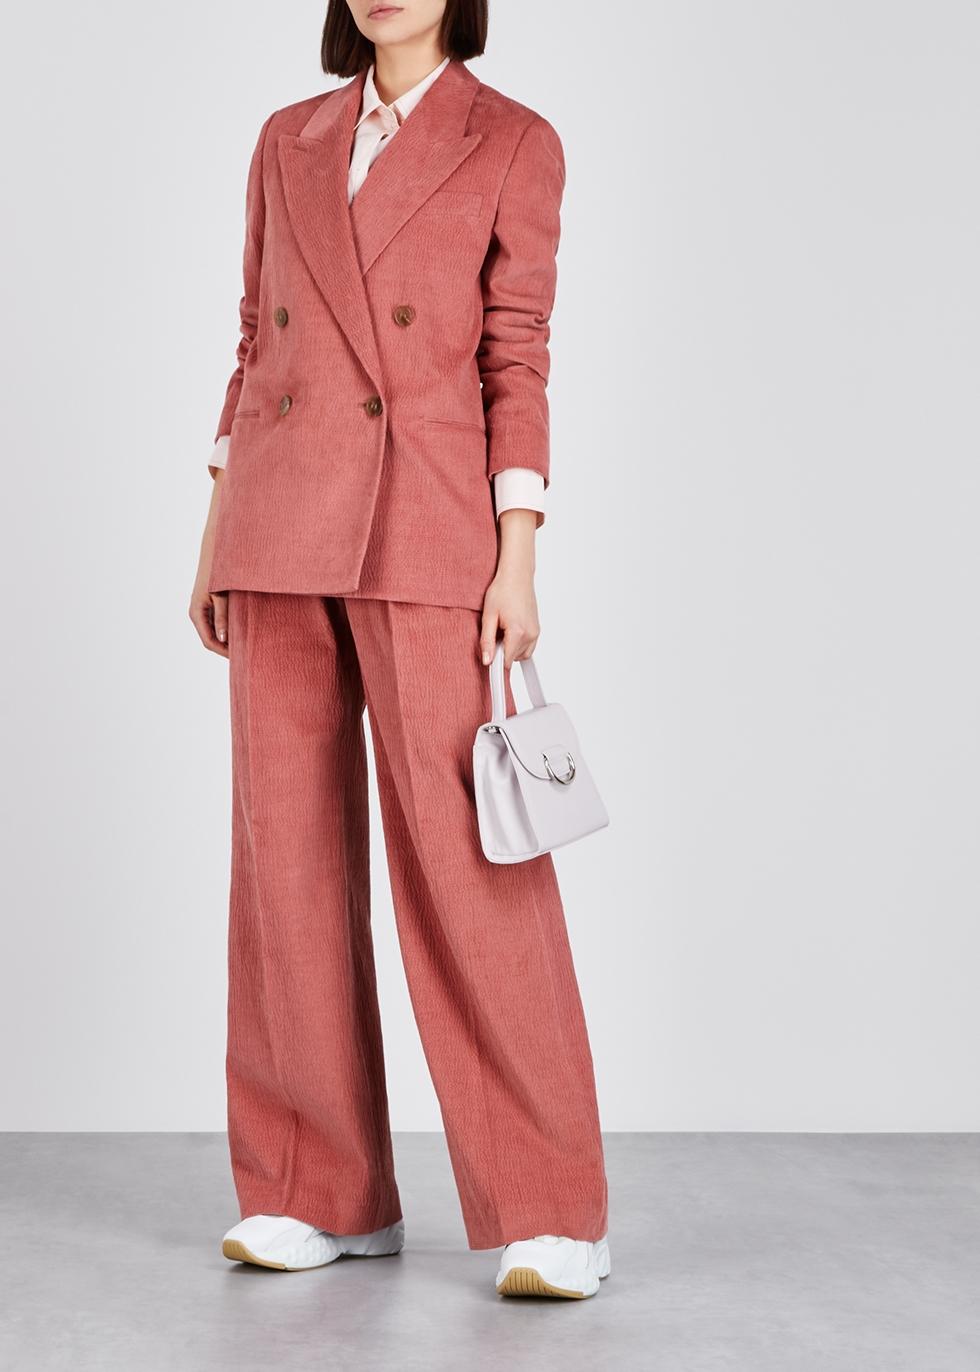 Harvey Nichols - Designer Fashion, Beauty, Food   Wine a4b373086623